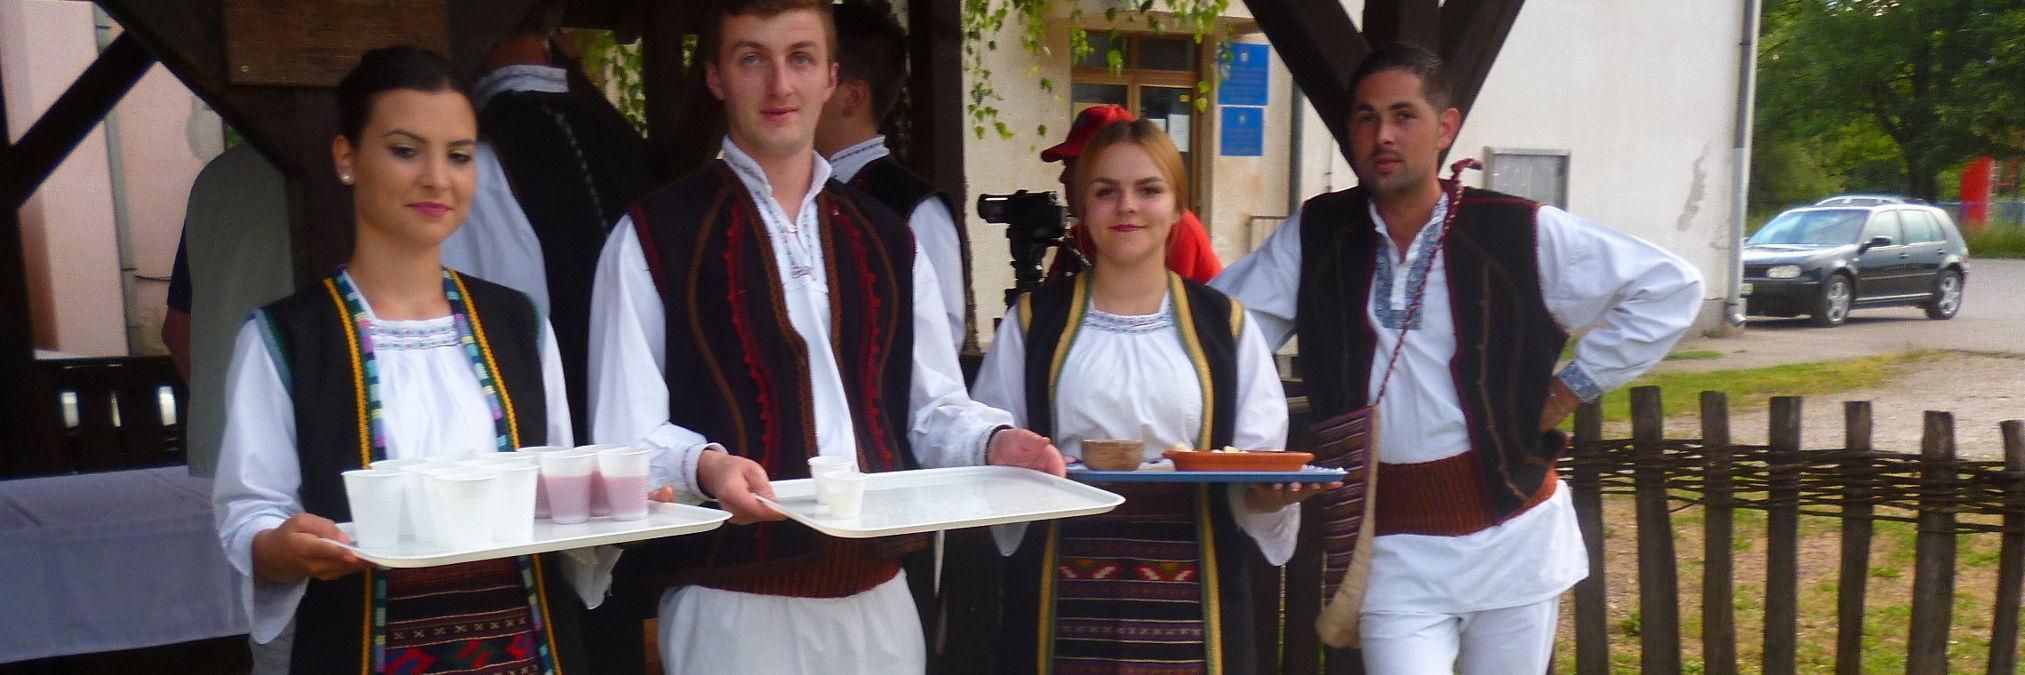 Как произвести хорошее впечатление на боснийца (и герцеговинца). Фото: Елена Арсениевич, CC BY-SA 3.0